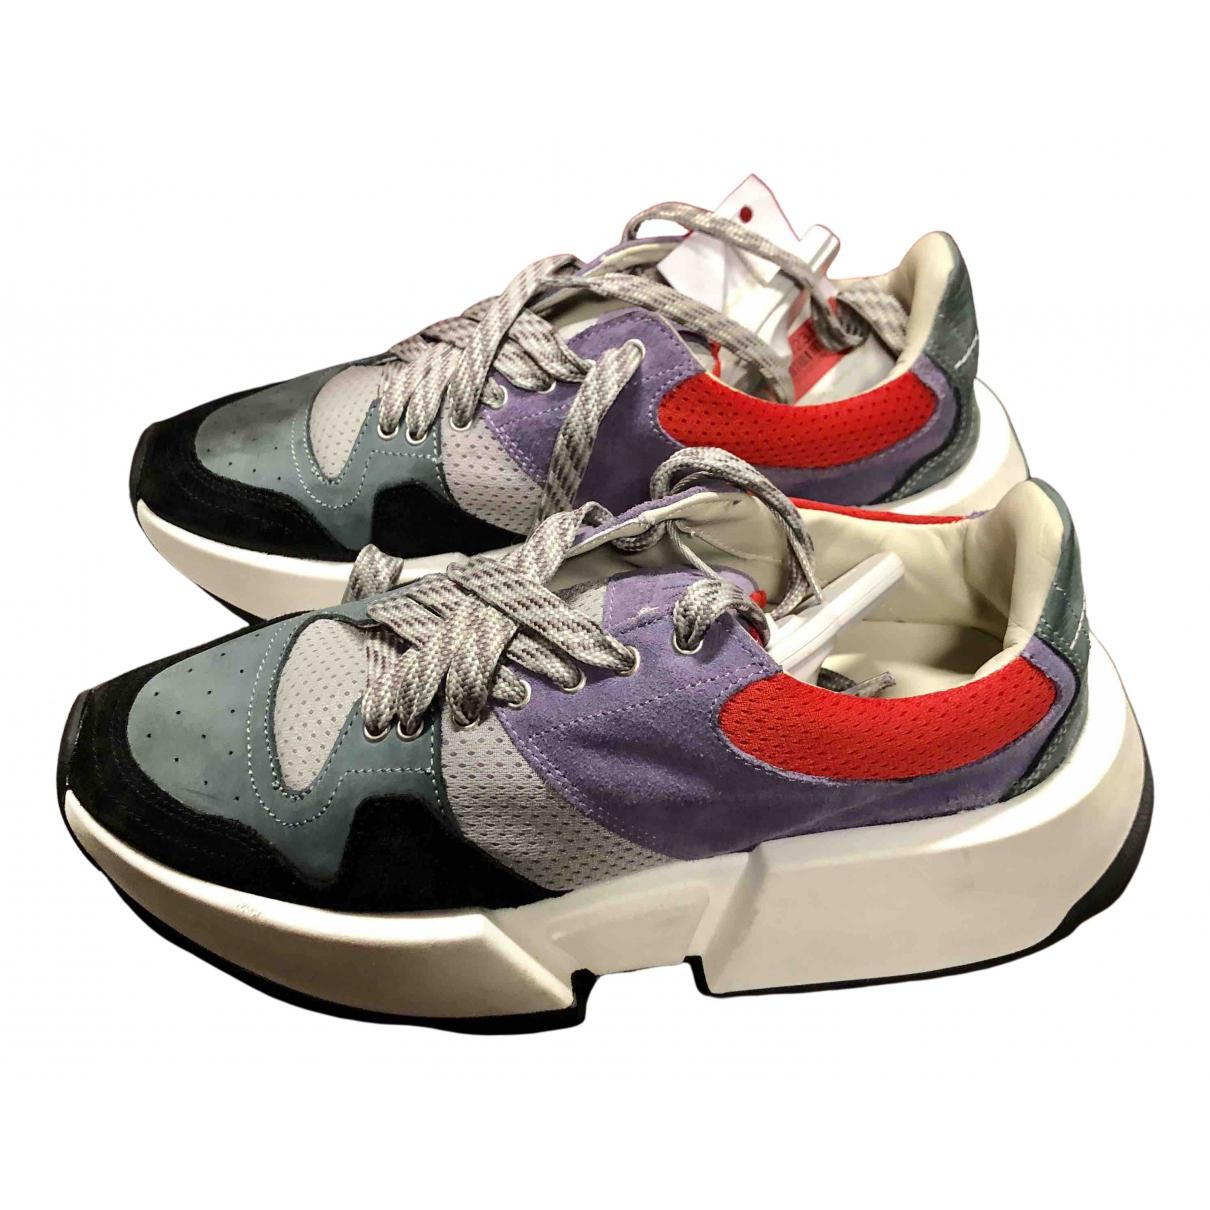 Mm6 N Purple Suede Trainers for Women 38 EU